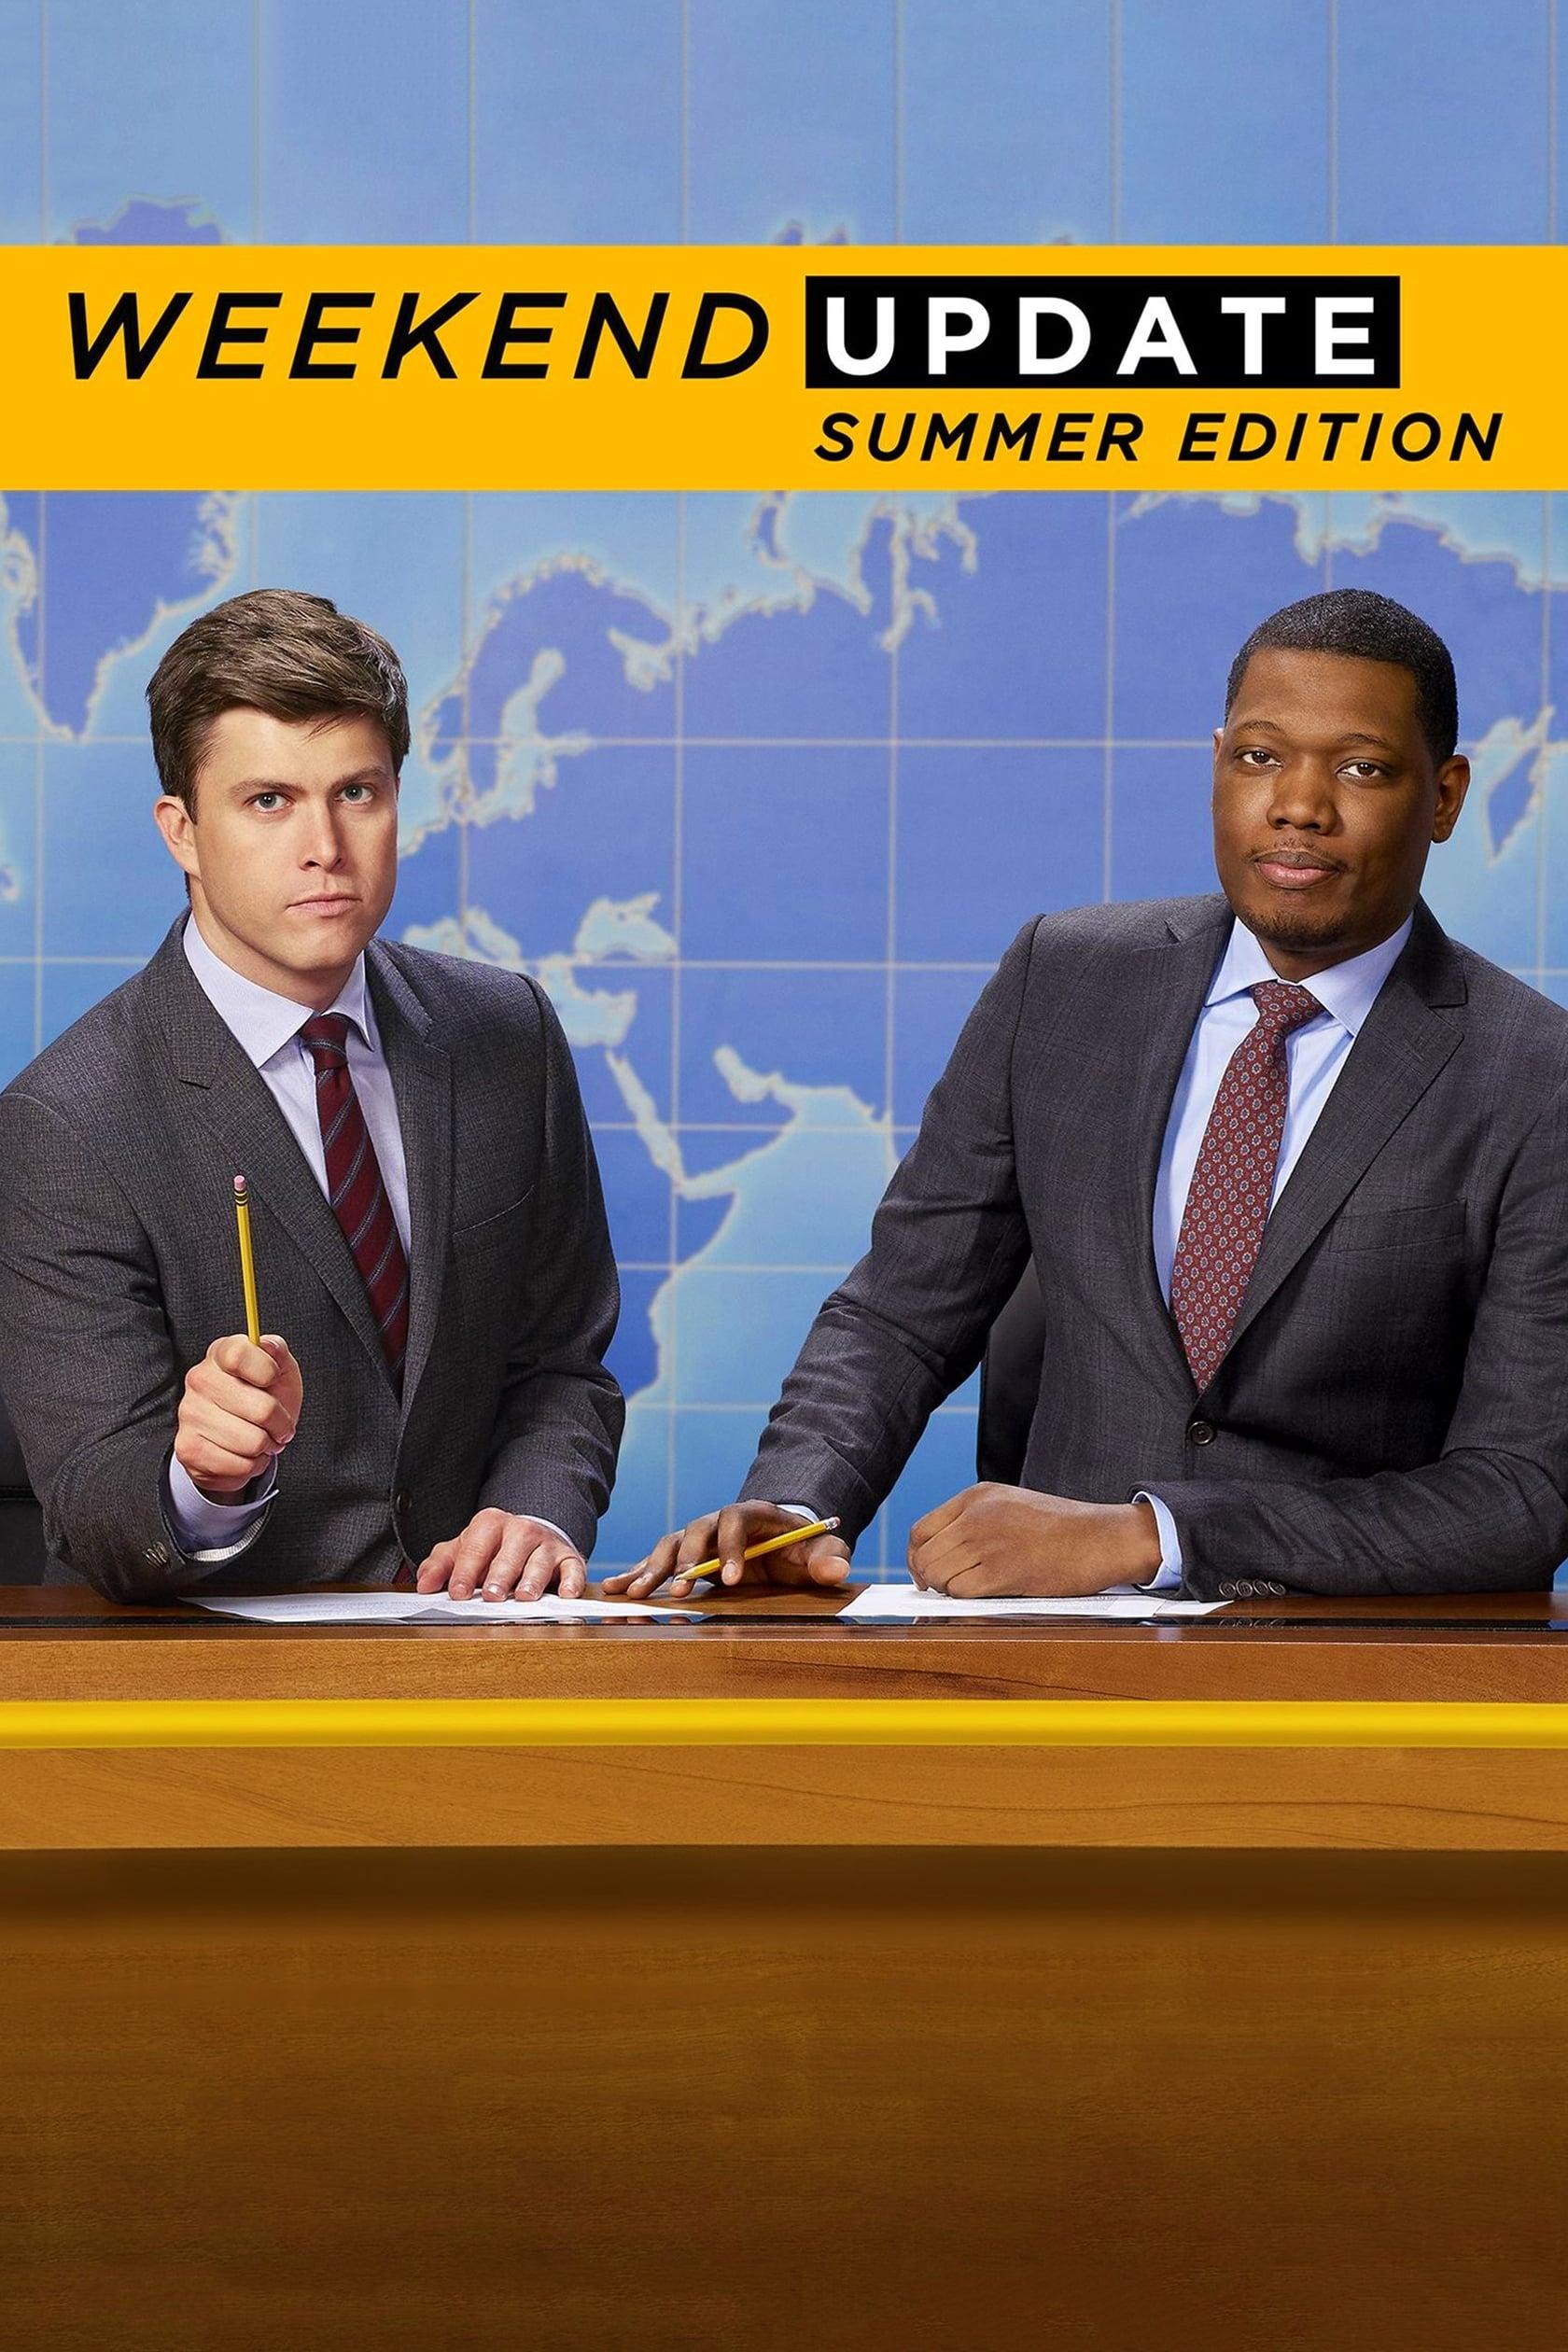 Saturday Night Live: Weekend Update Summer Edition